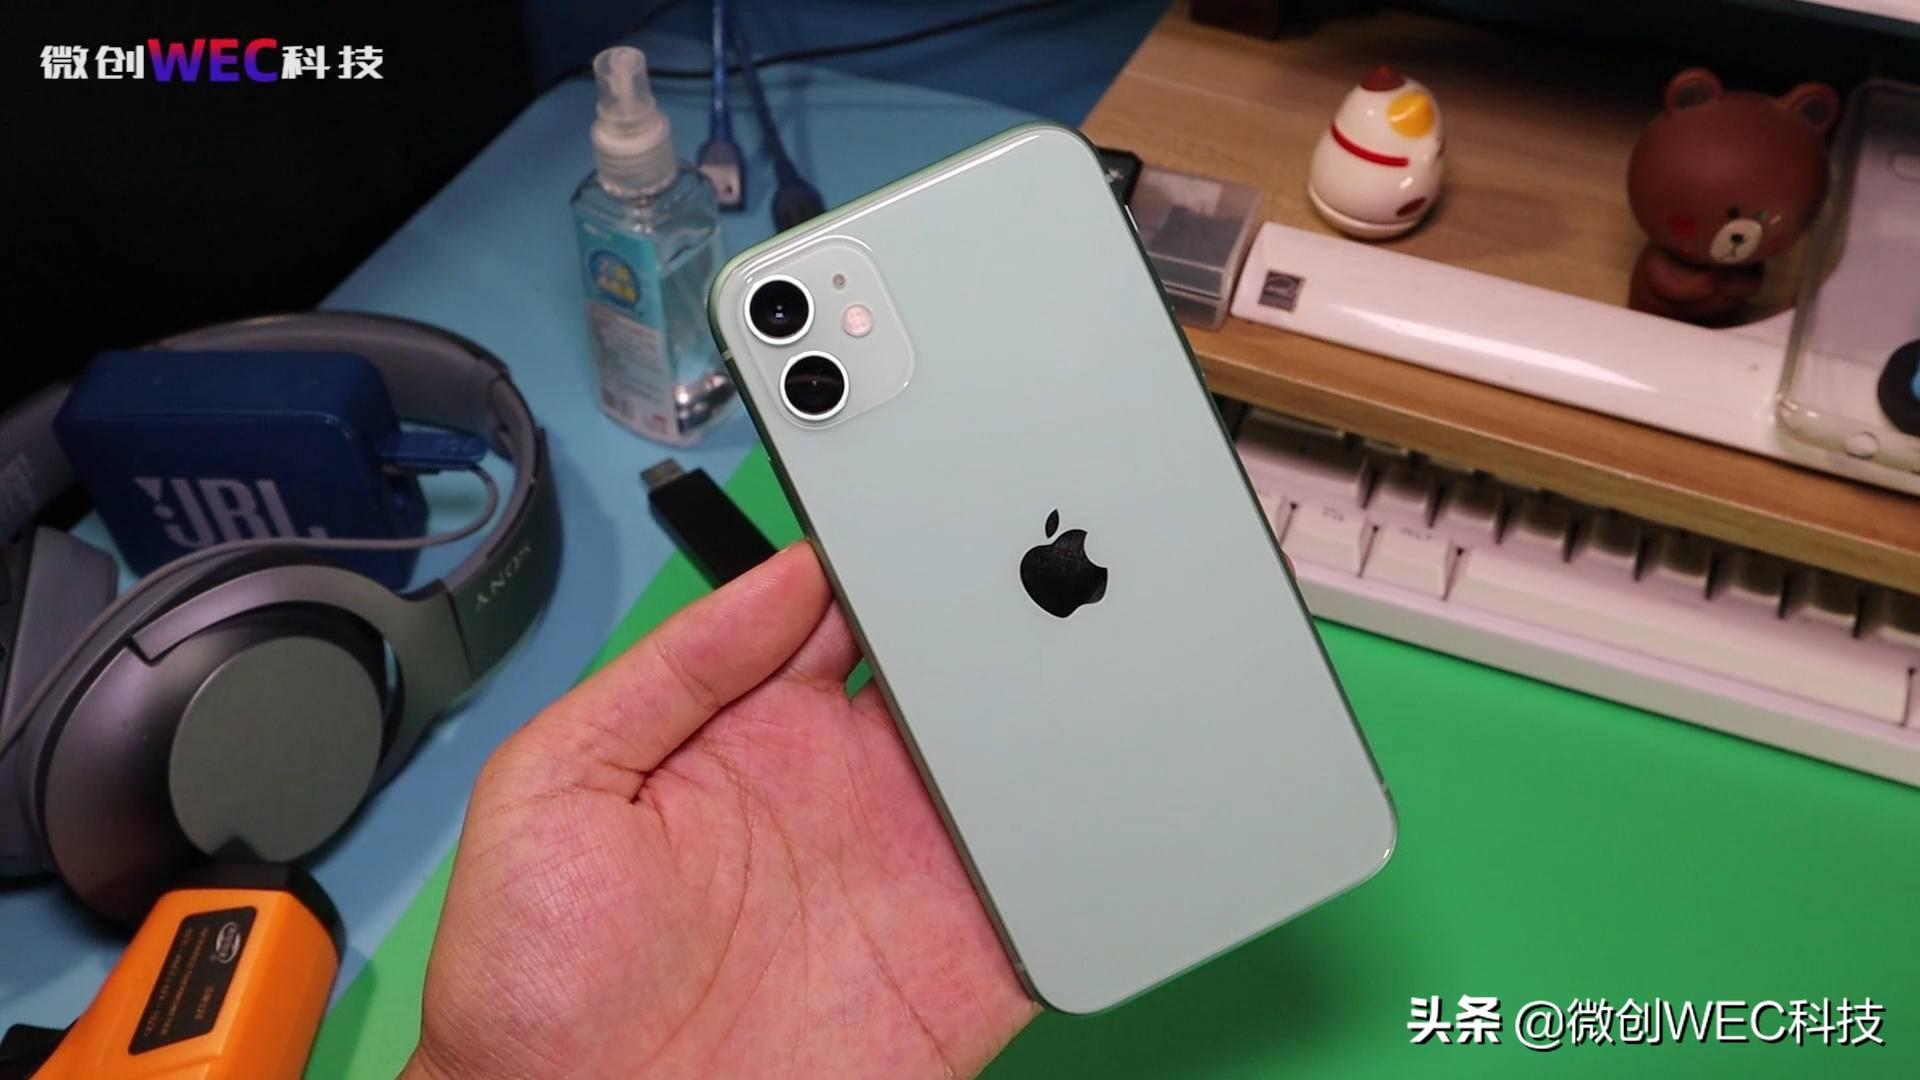 iPhone 12真香警告!全系列价钱曝出,最划算5499元起